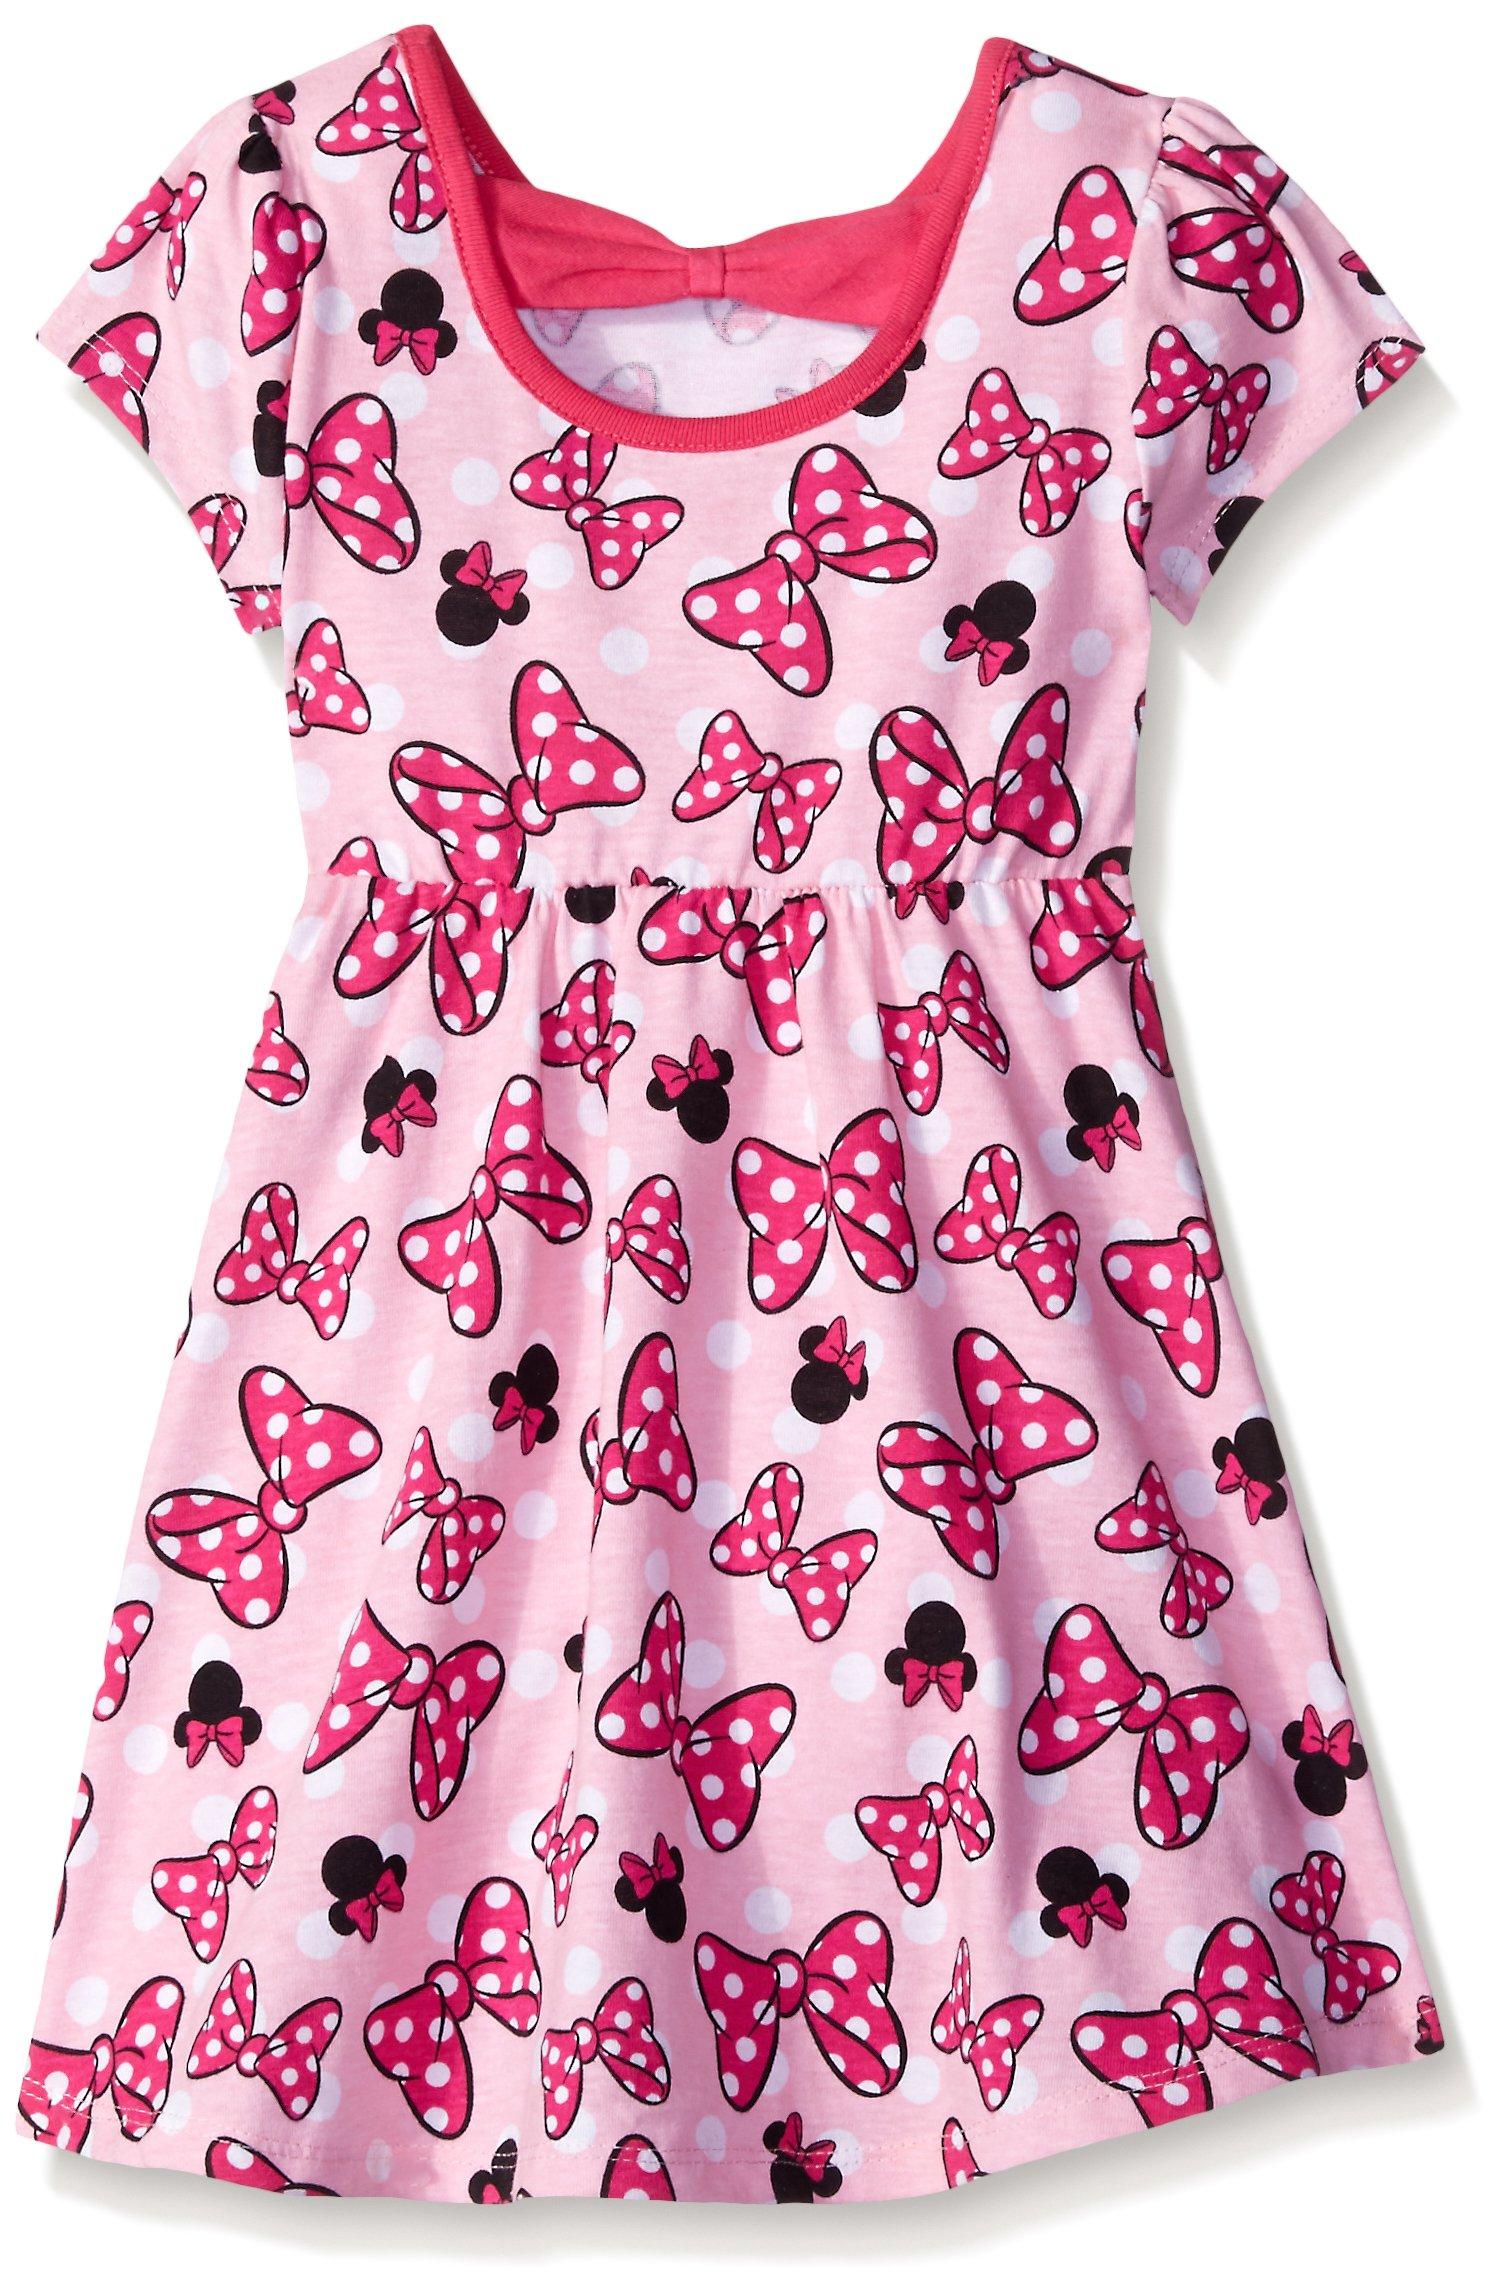 Disney Little Girls' 2 Pack Love Minnie Dresses, Pink, 6X by Disney (Image #2)